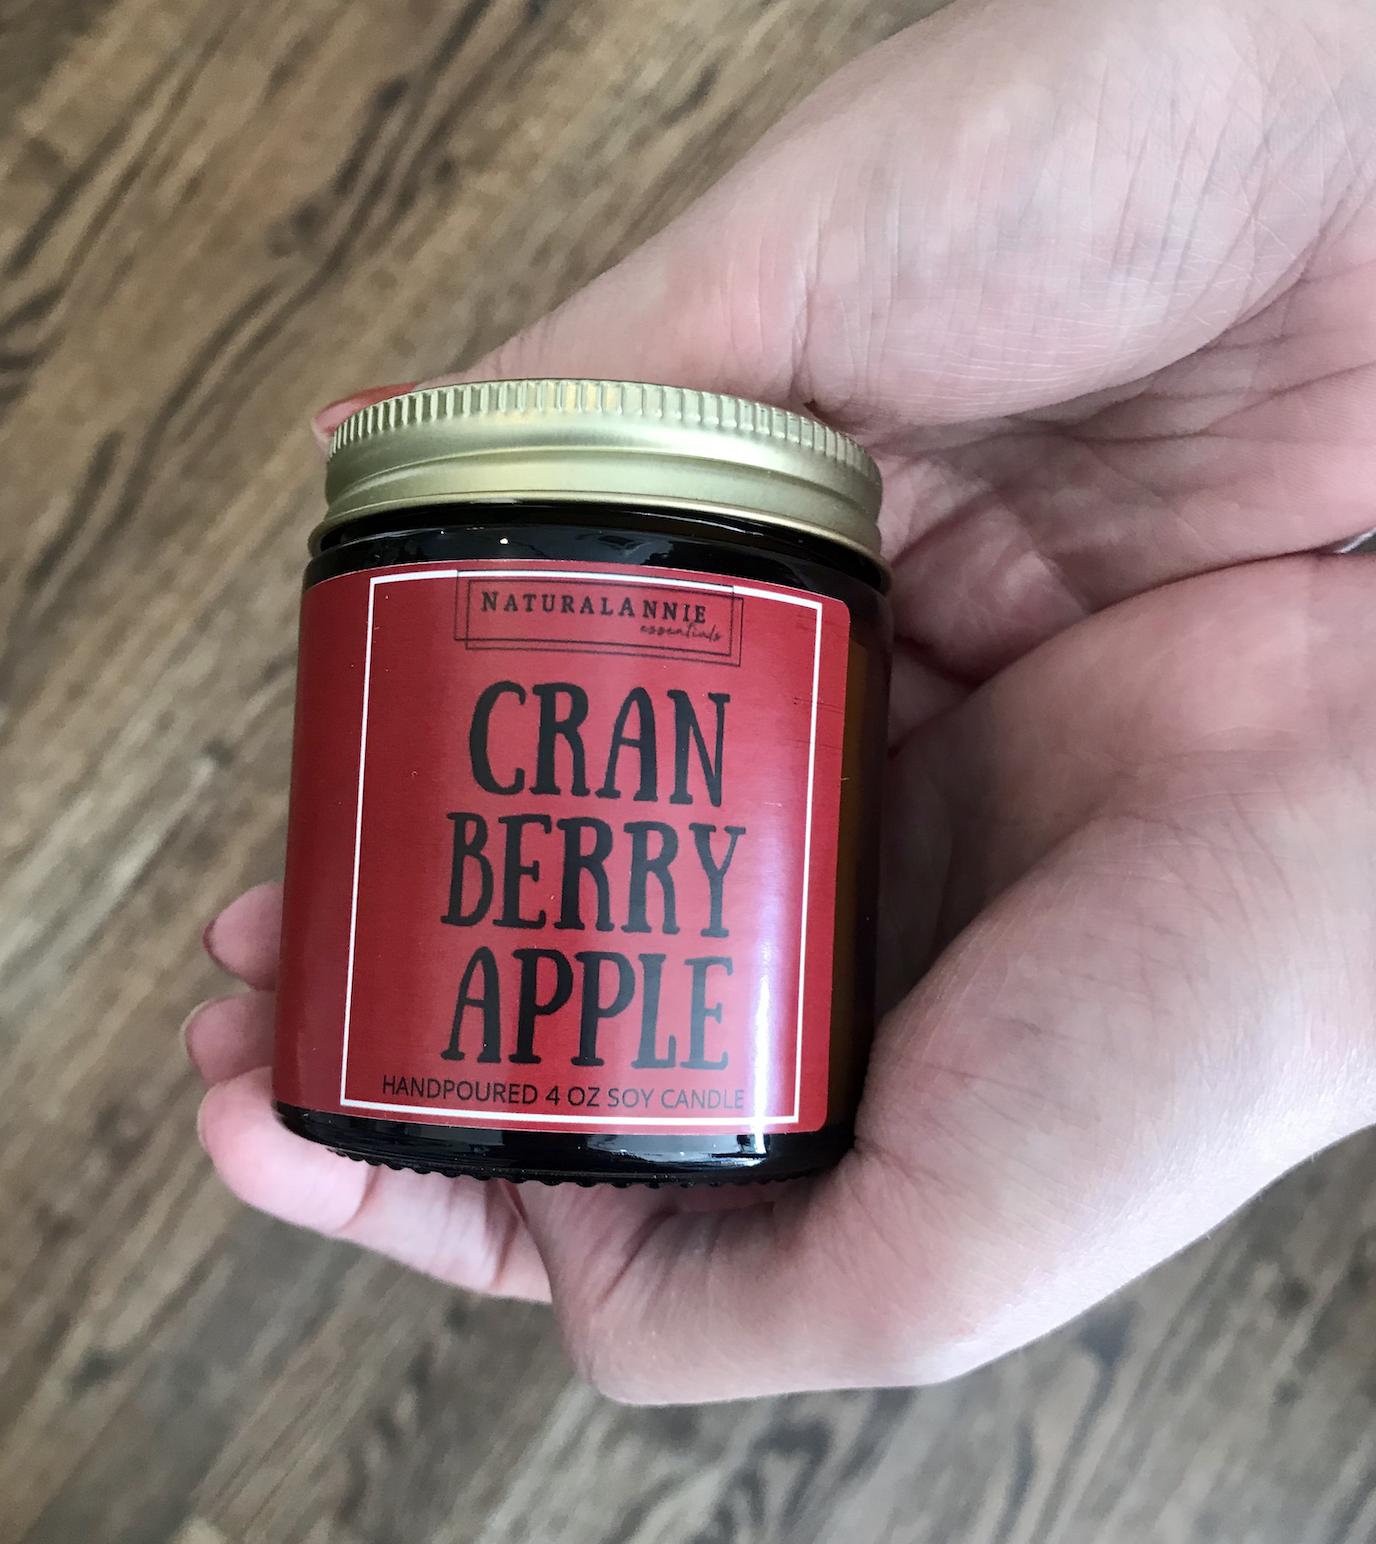 NaturalAnnie Essentials Cranberry Apple 4oz Soy Candle